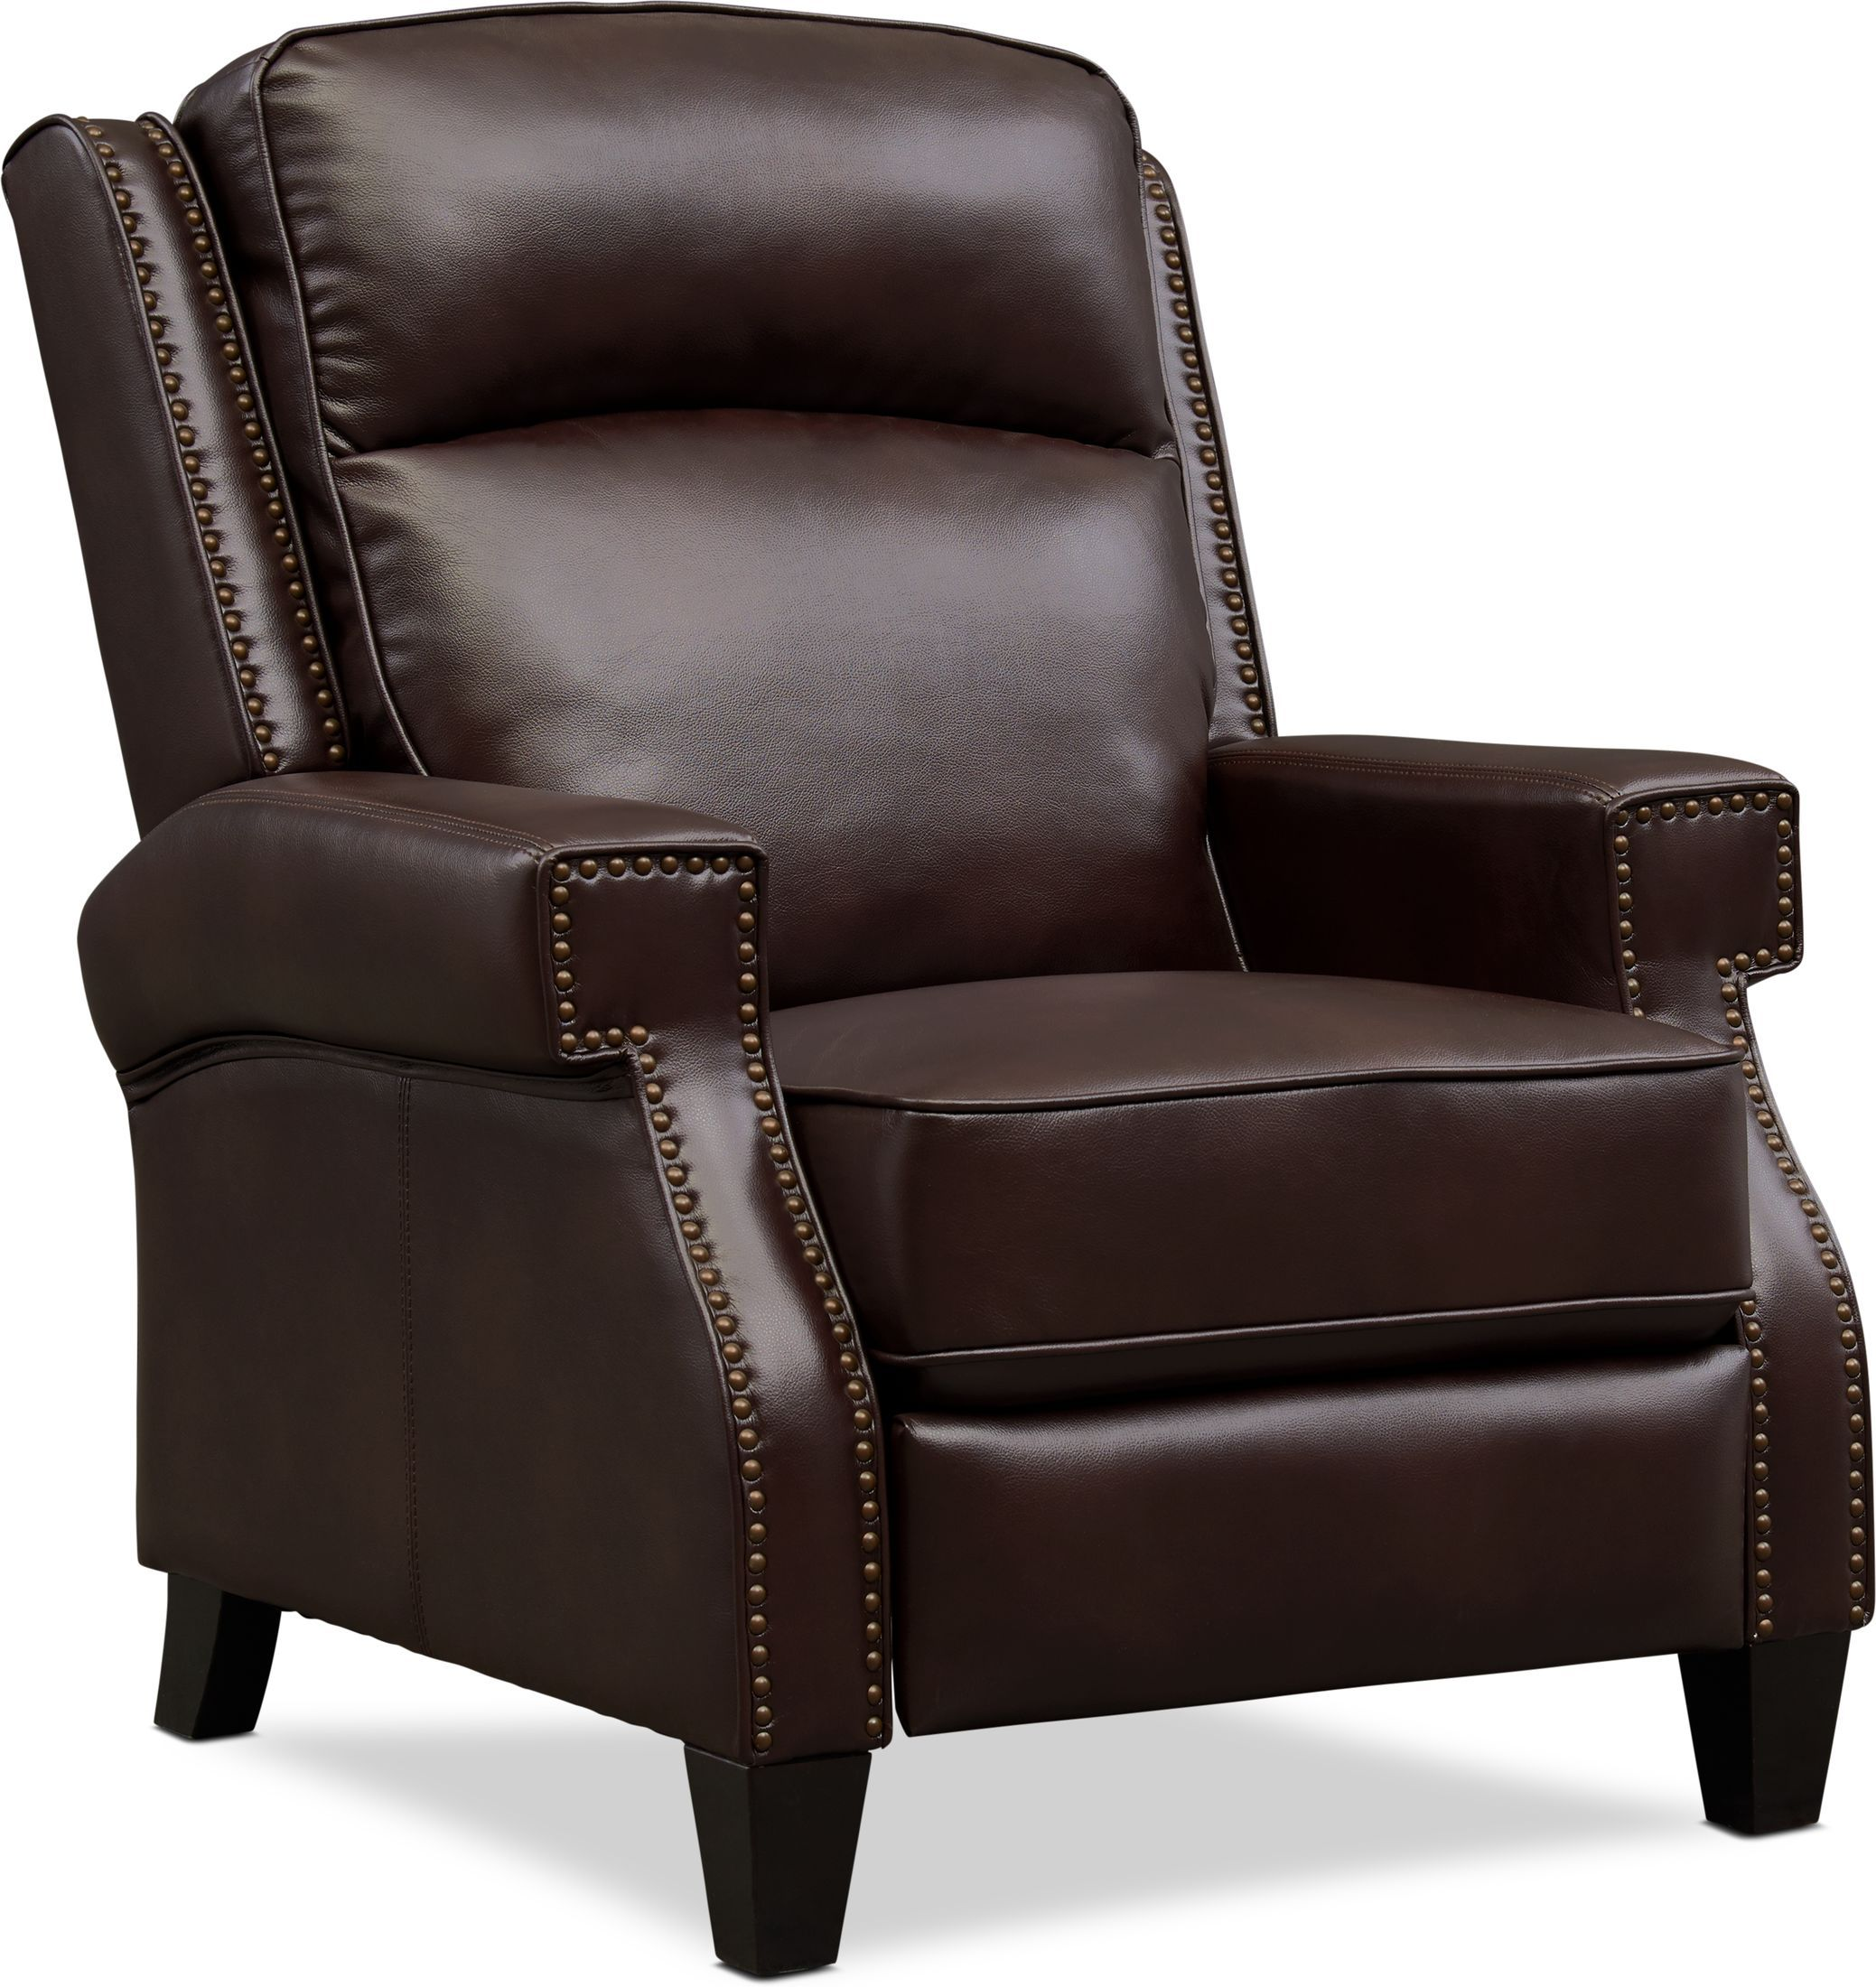 James Pushback Recliner in 2020 | Value city furniture ...